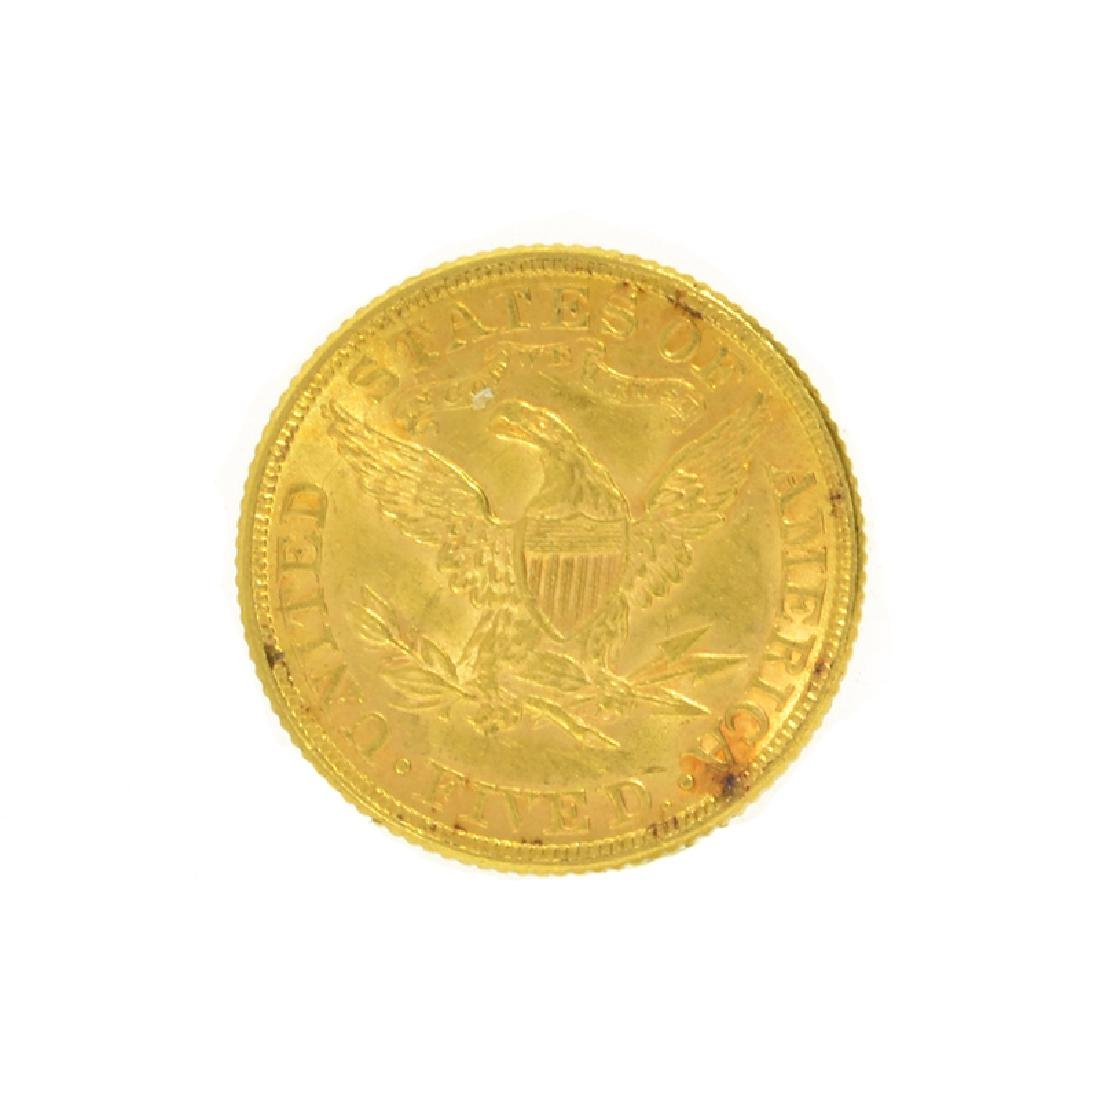 *1881 $5 U.S. Liberty Head Gold Coin (DF) - 2